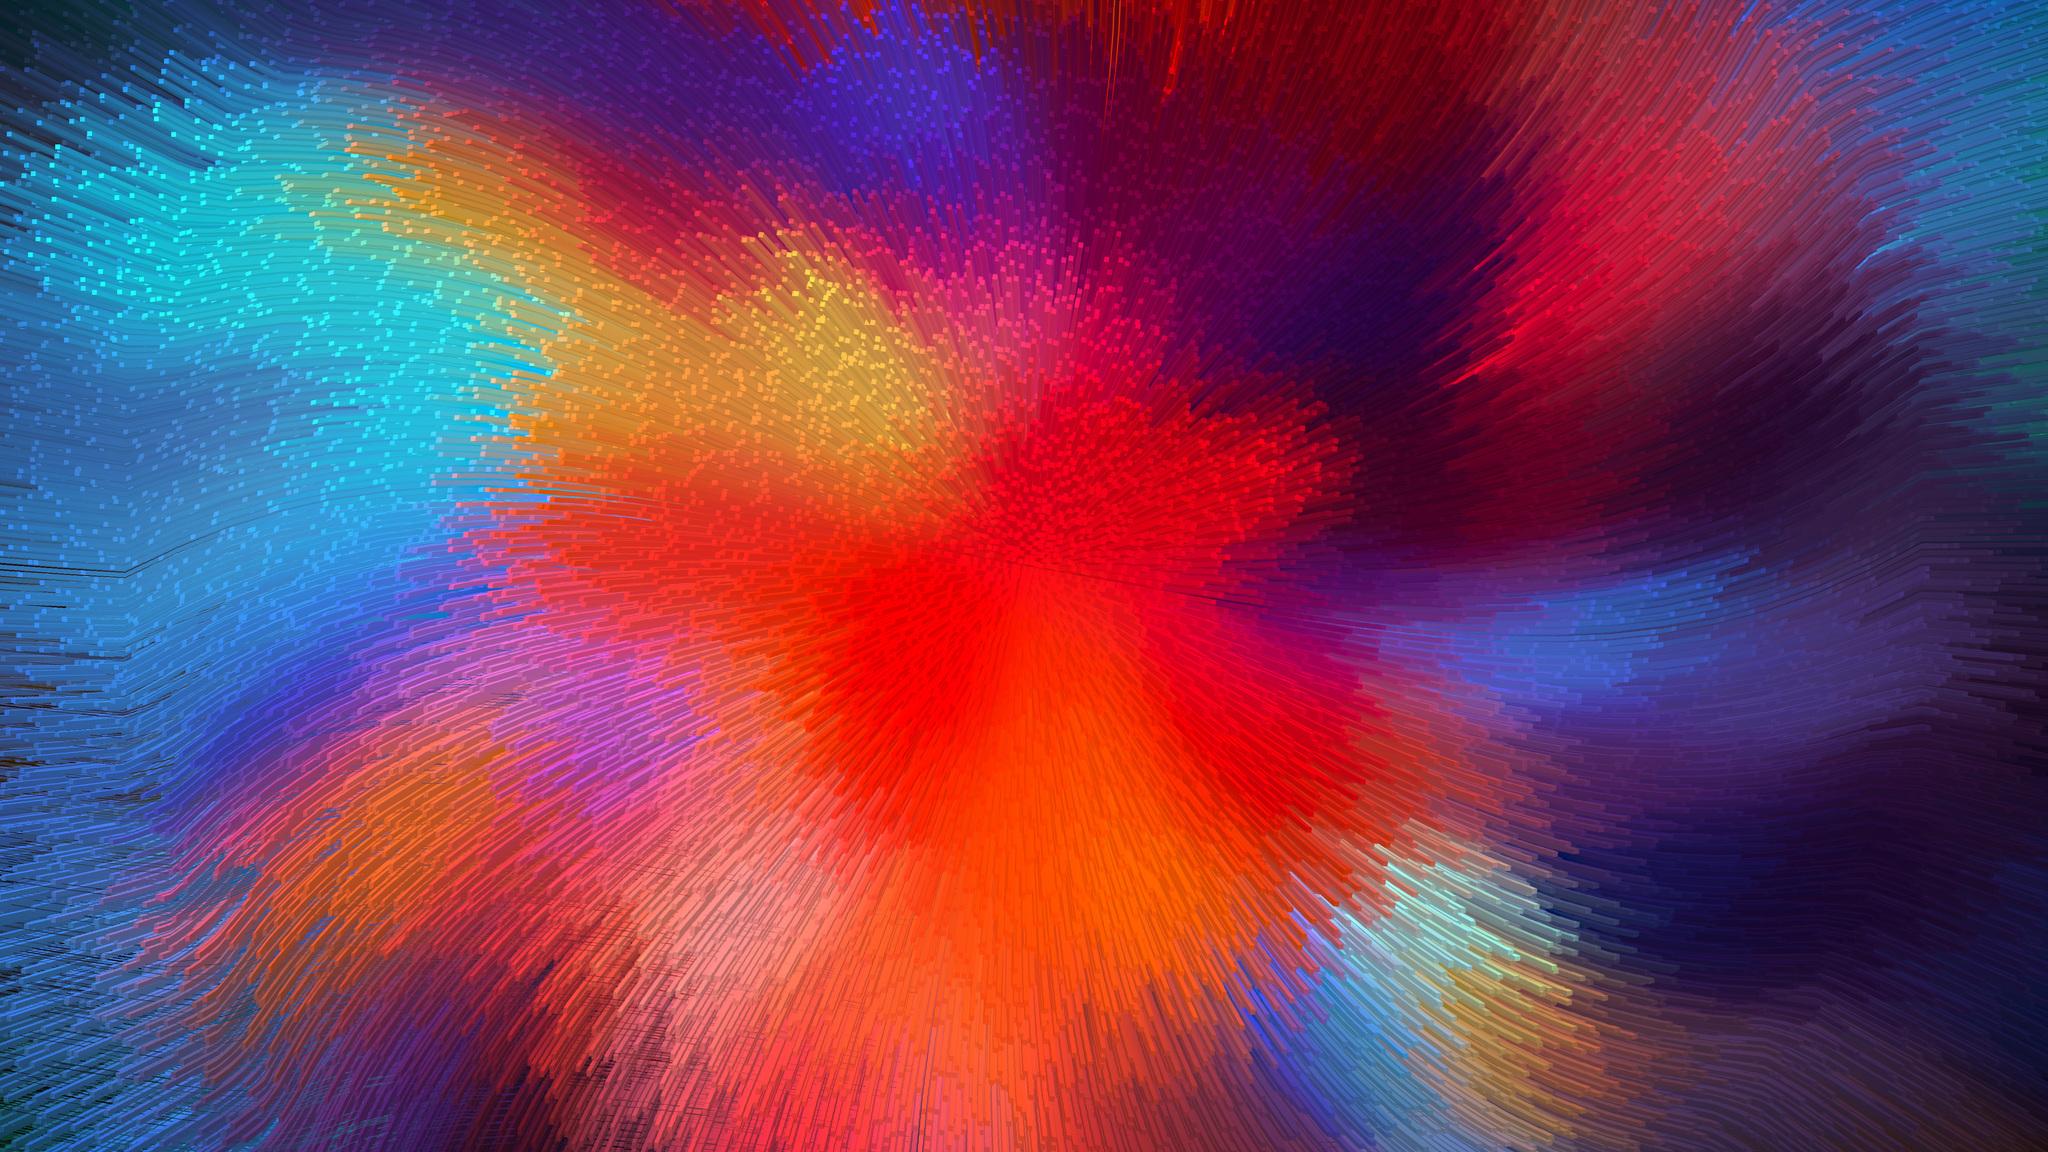 circle-colorful-wave-abstract-5k-1c.jpg